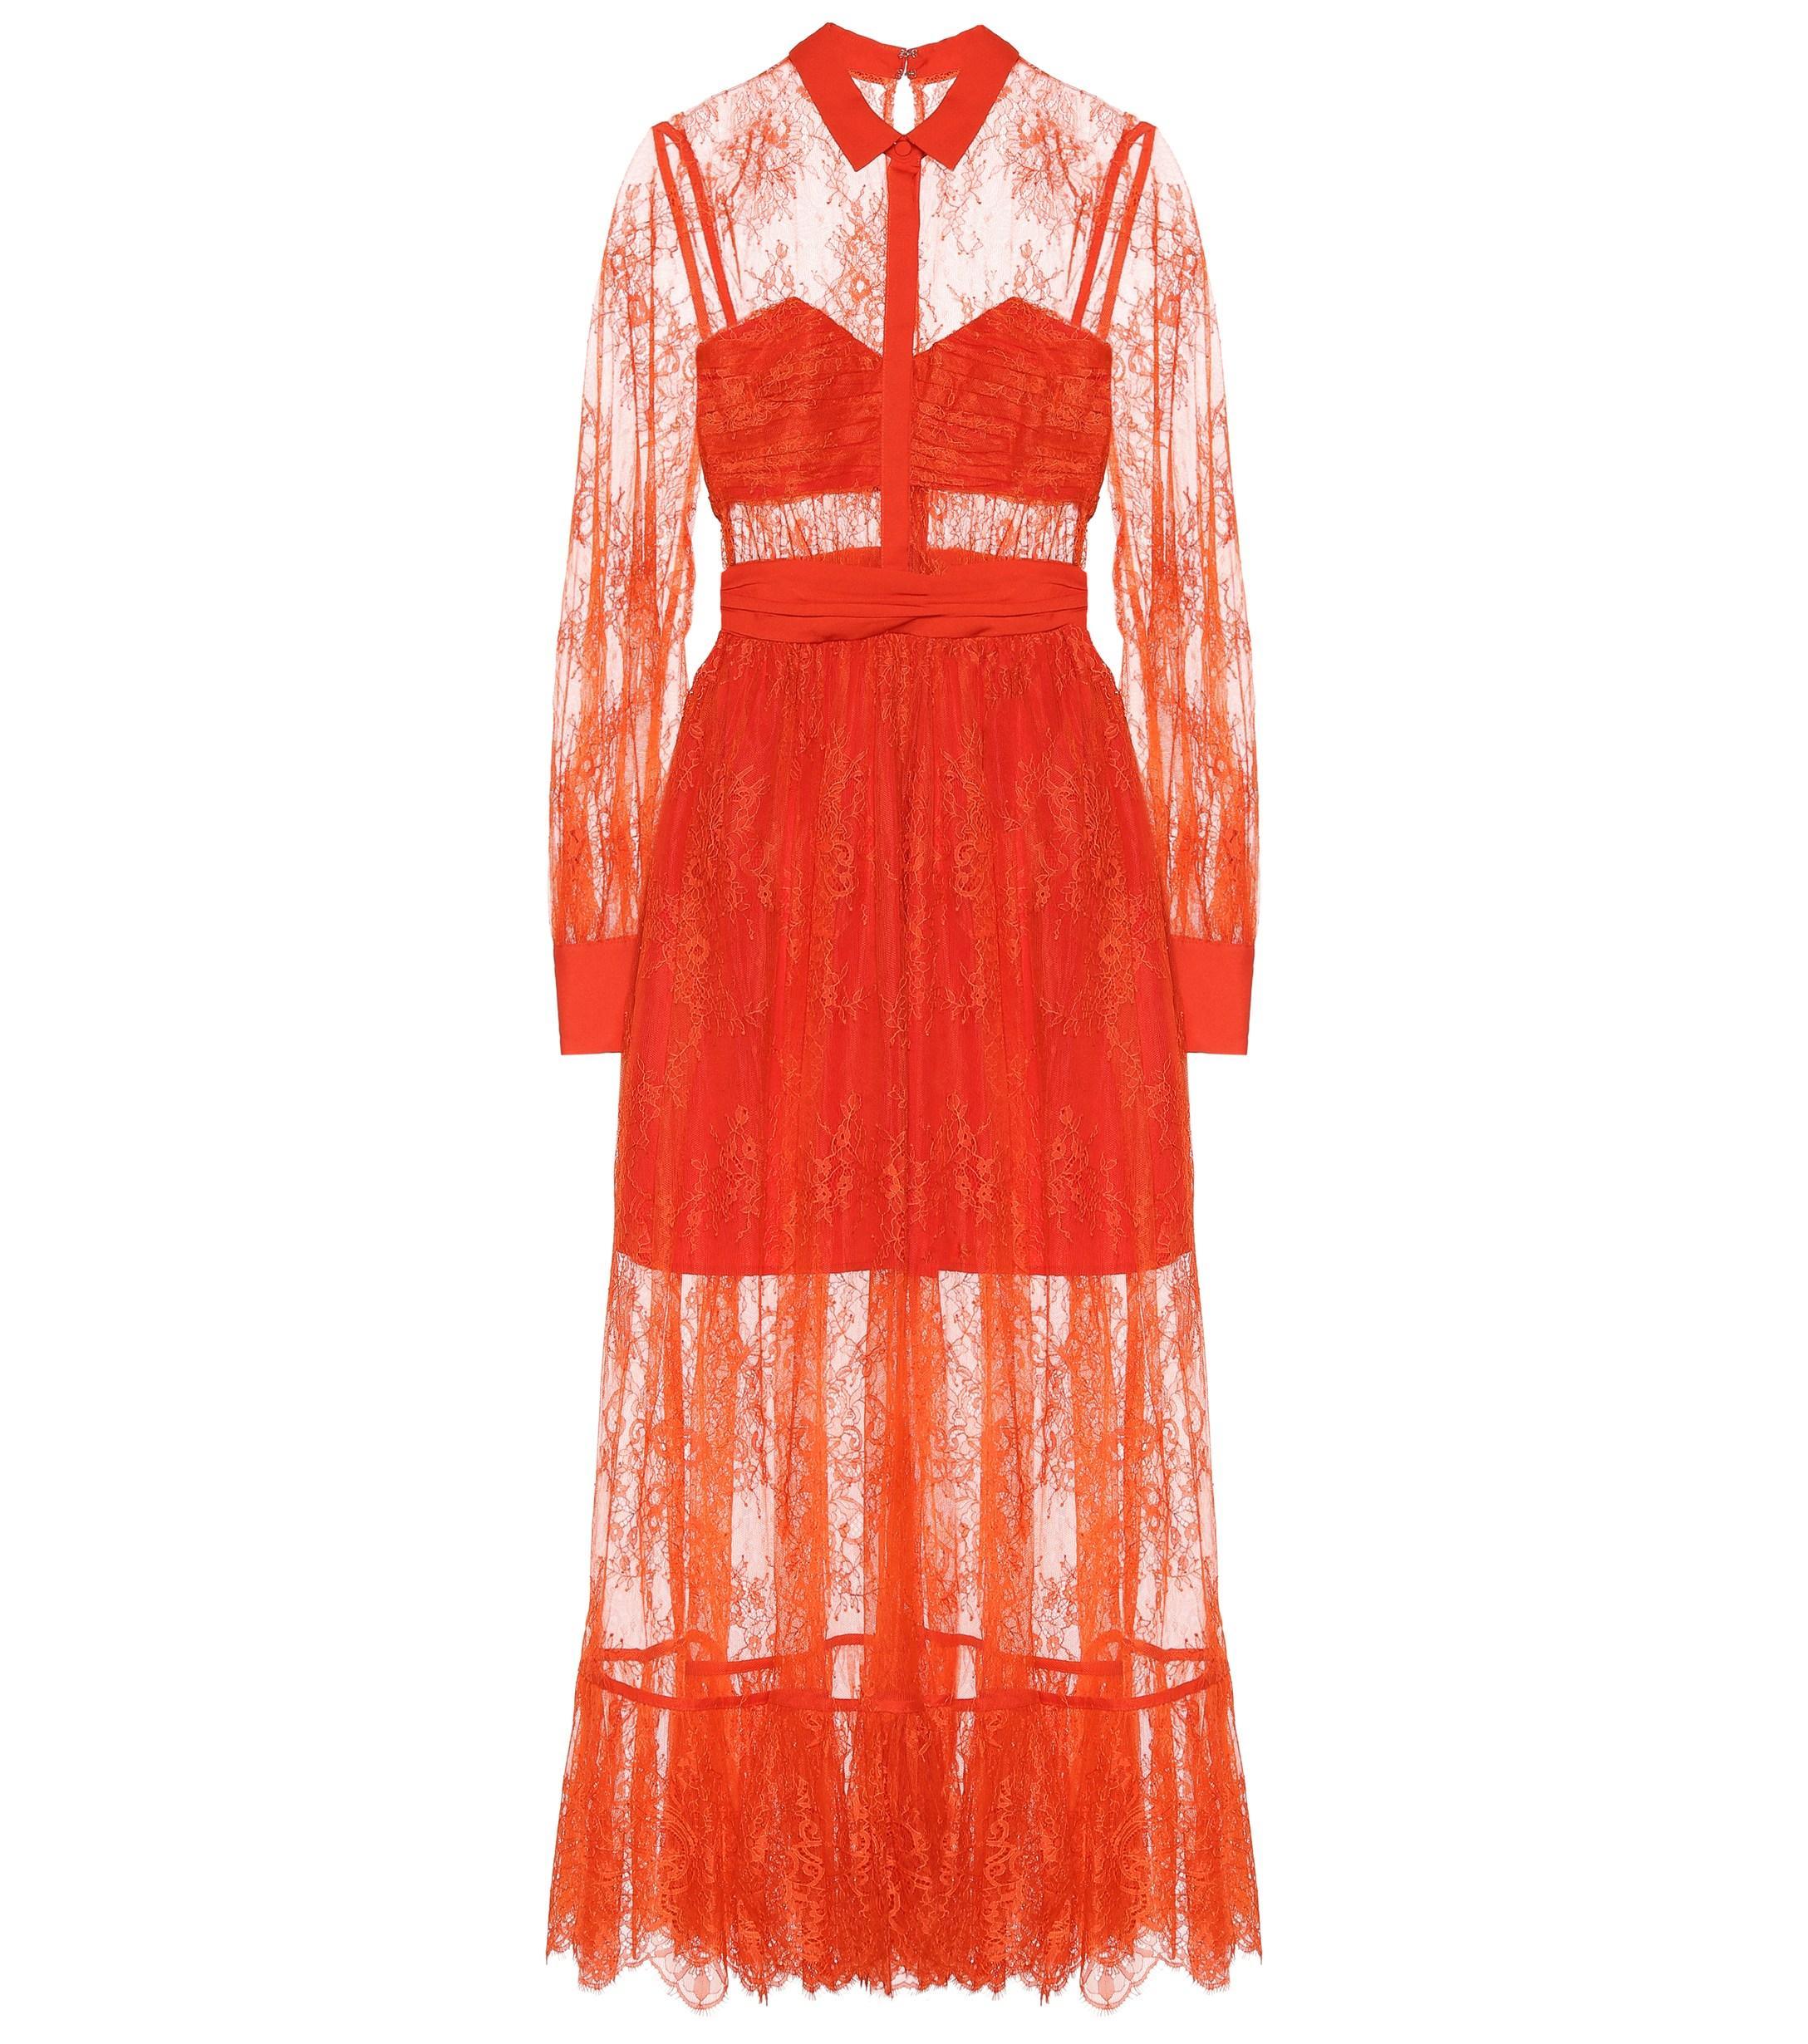 771ee84c182 Self-Portrait - Red Lace Midi Dress - Lyst. View fullscreen